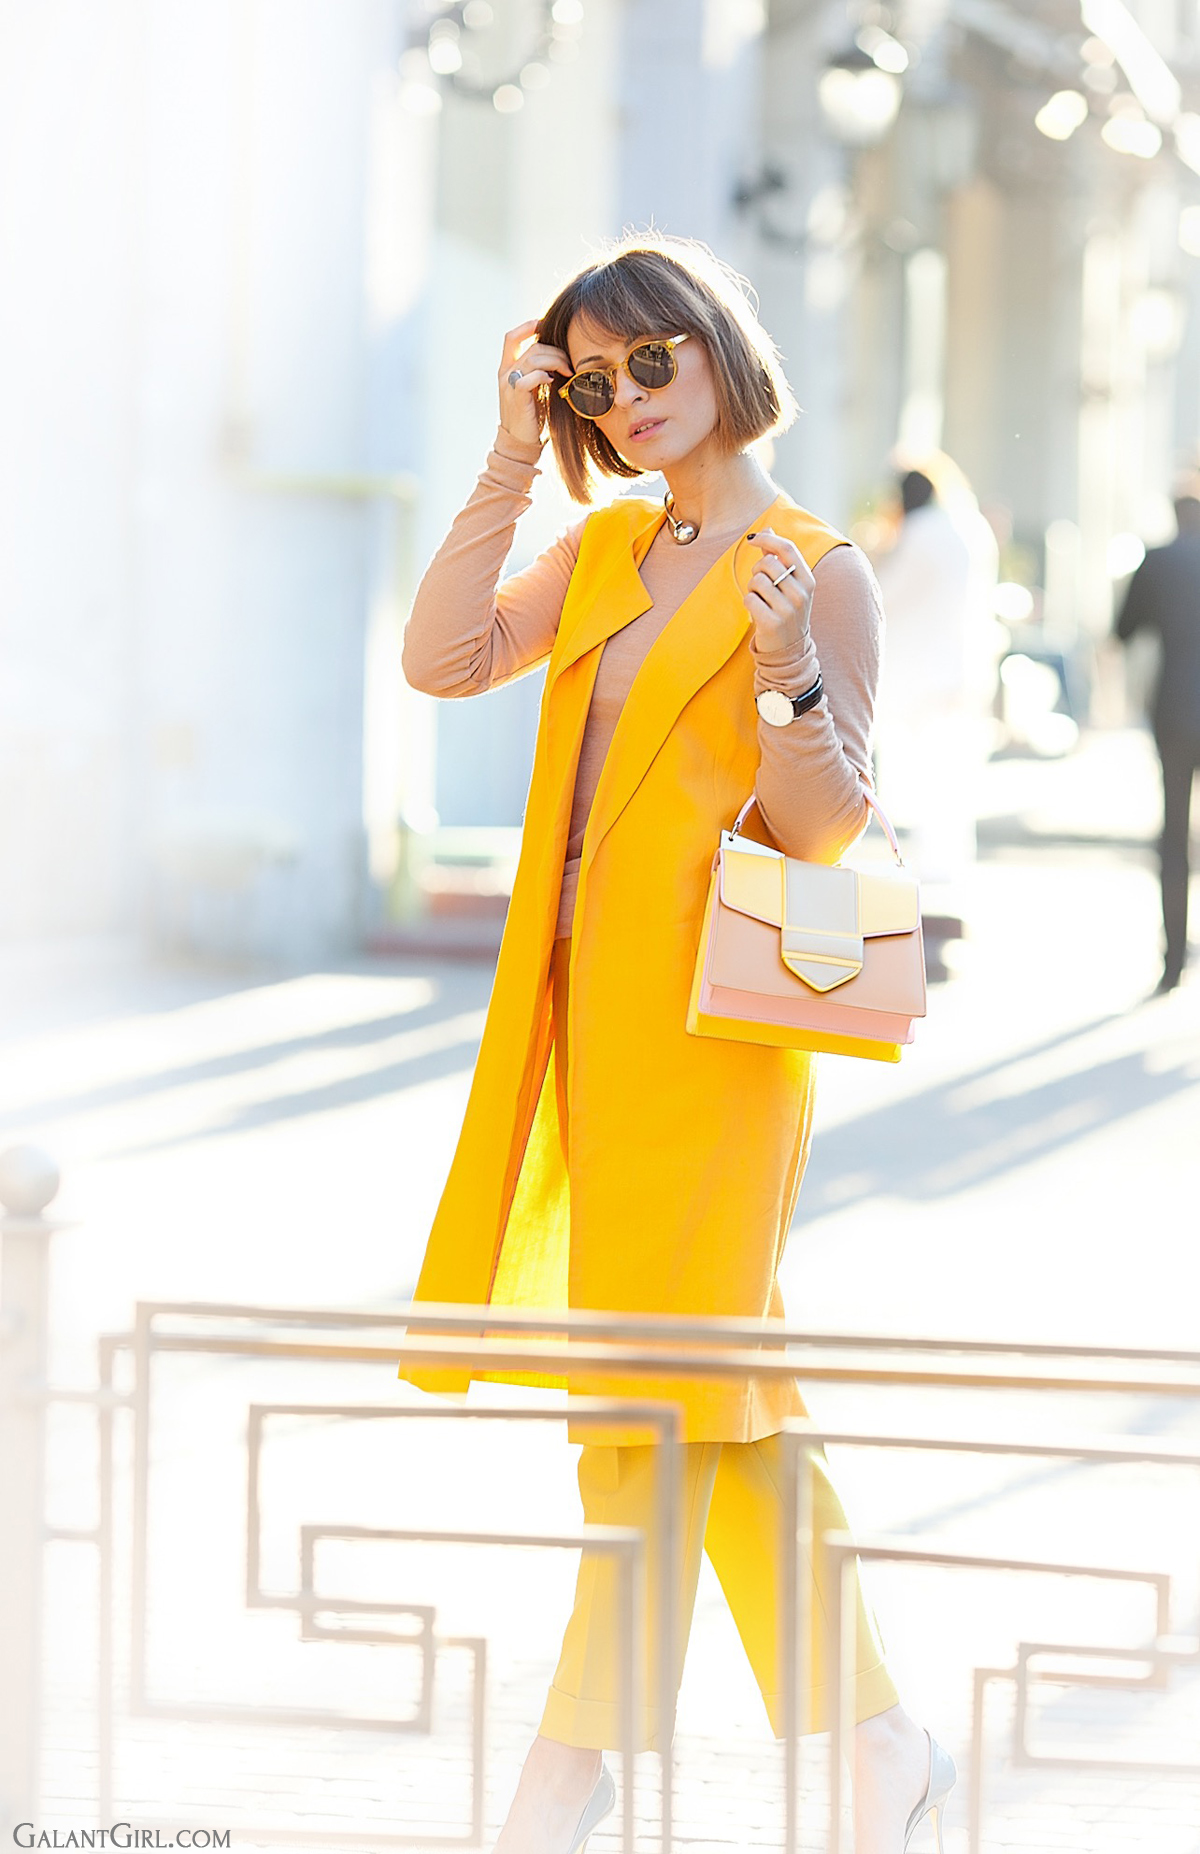 zara orange vest and sara battaglia bag, spring look, fashion trends 2015, galant girl